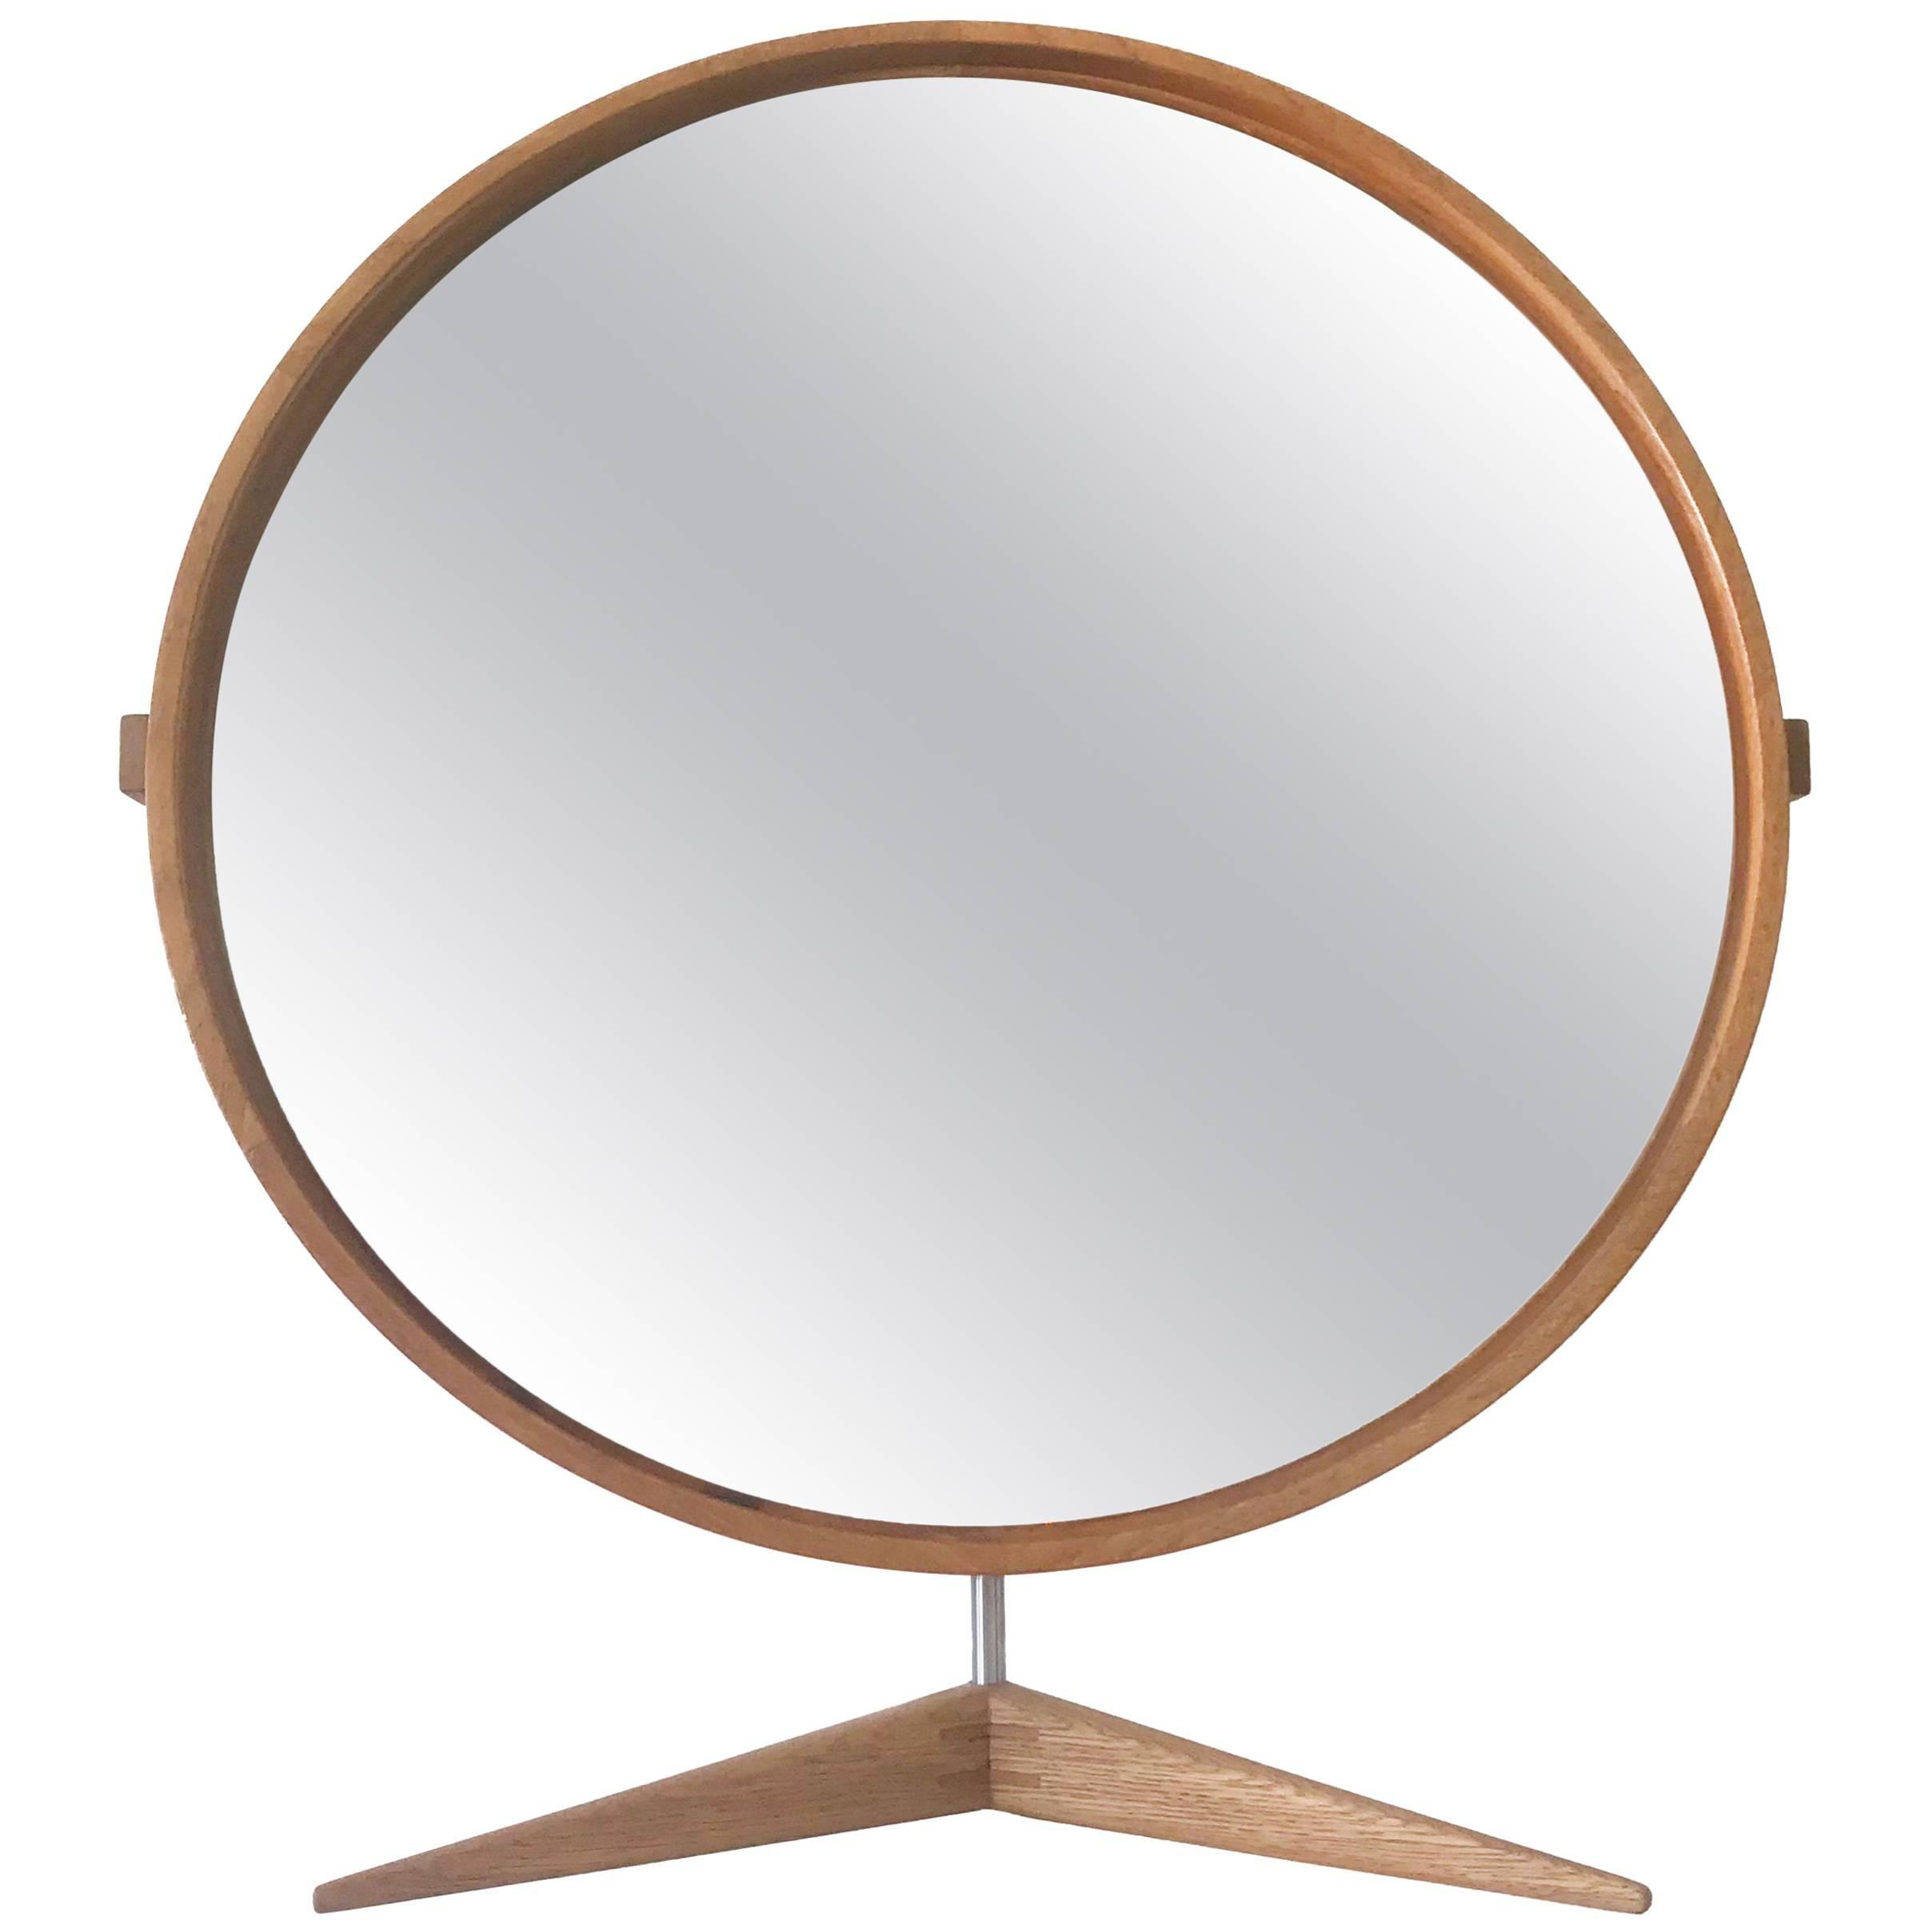 Elegant Oak Table Mirror by Uno & Östen Kristiansson for Luxus Sweden 1960s